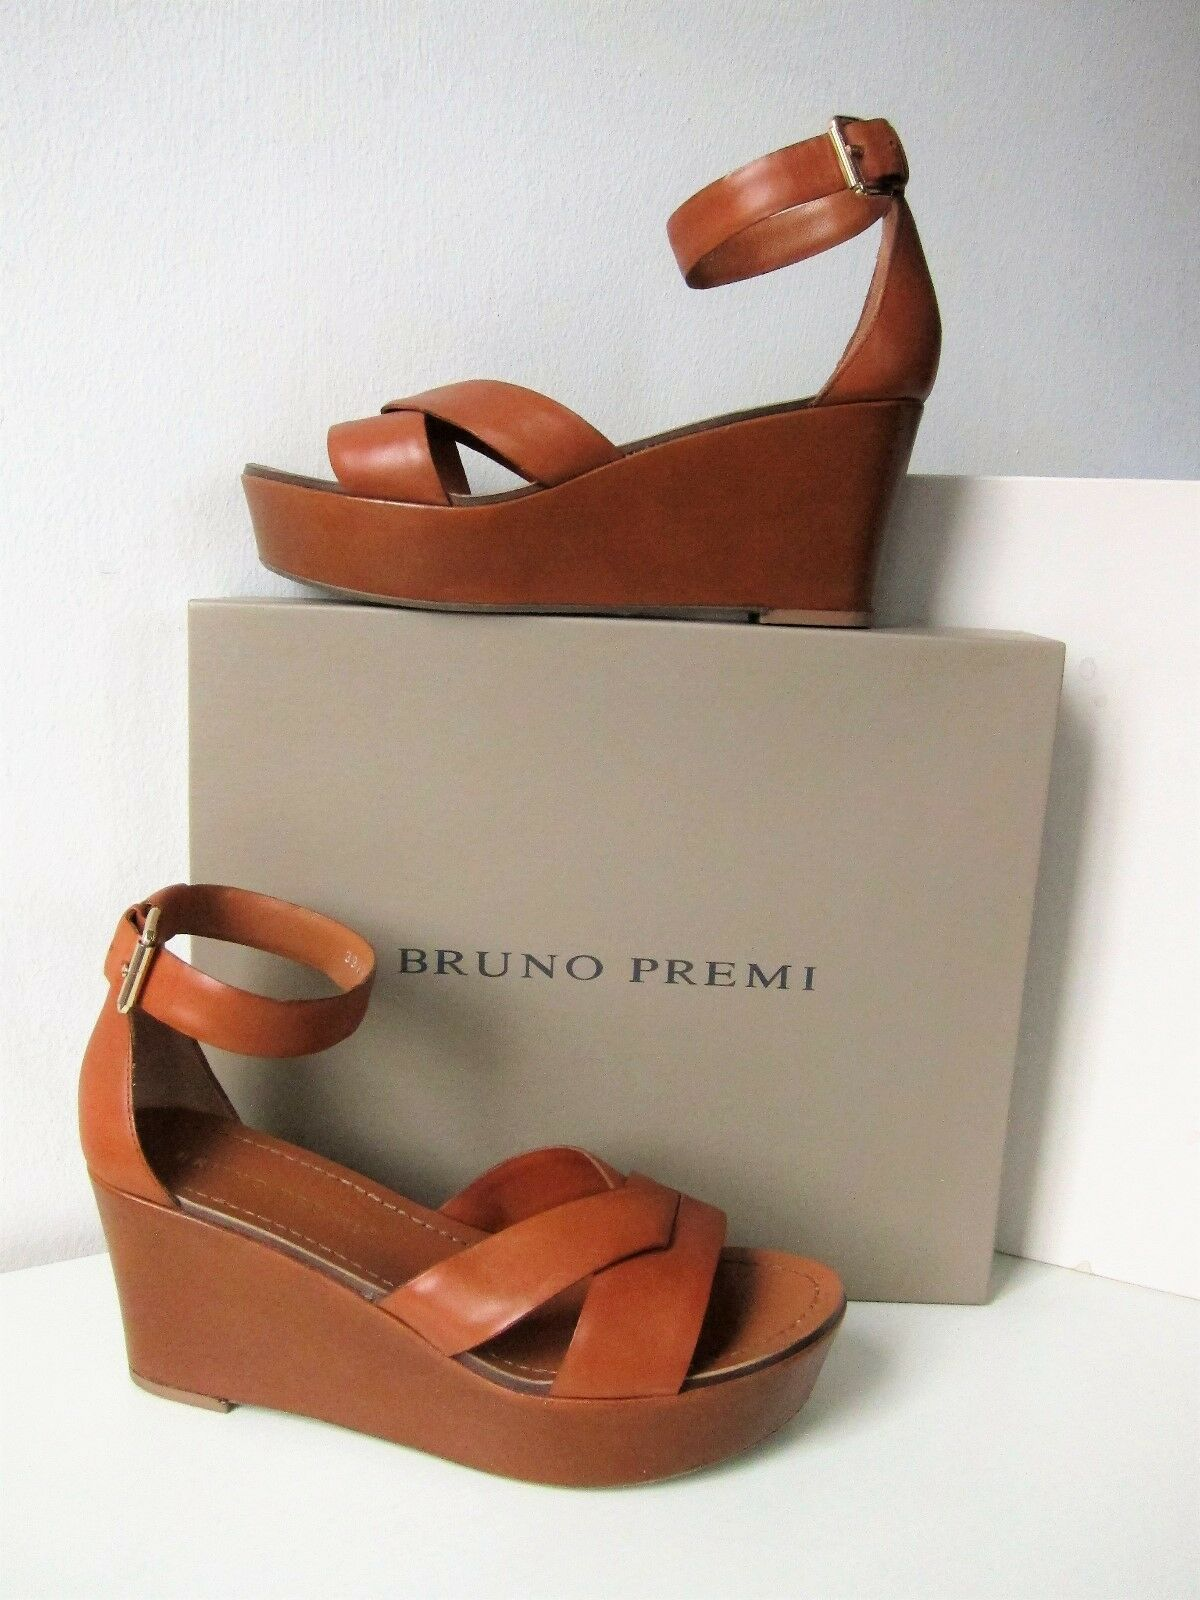 NUOVO Bruno Premi Sandalo Sandali Tg 39 Plateau Cognac Marronee Marronee sandals OVP